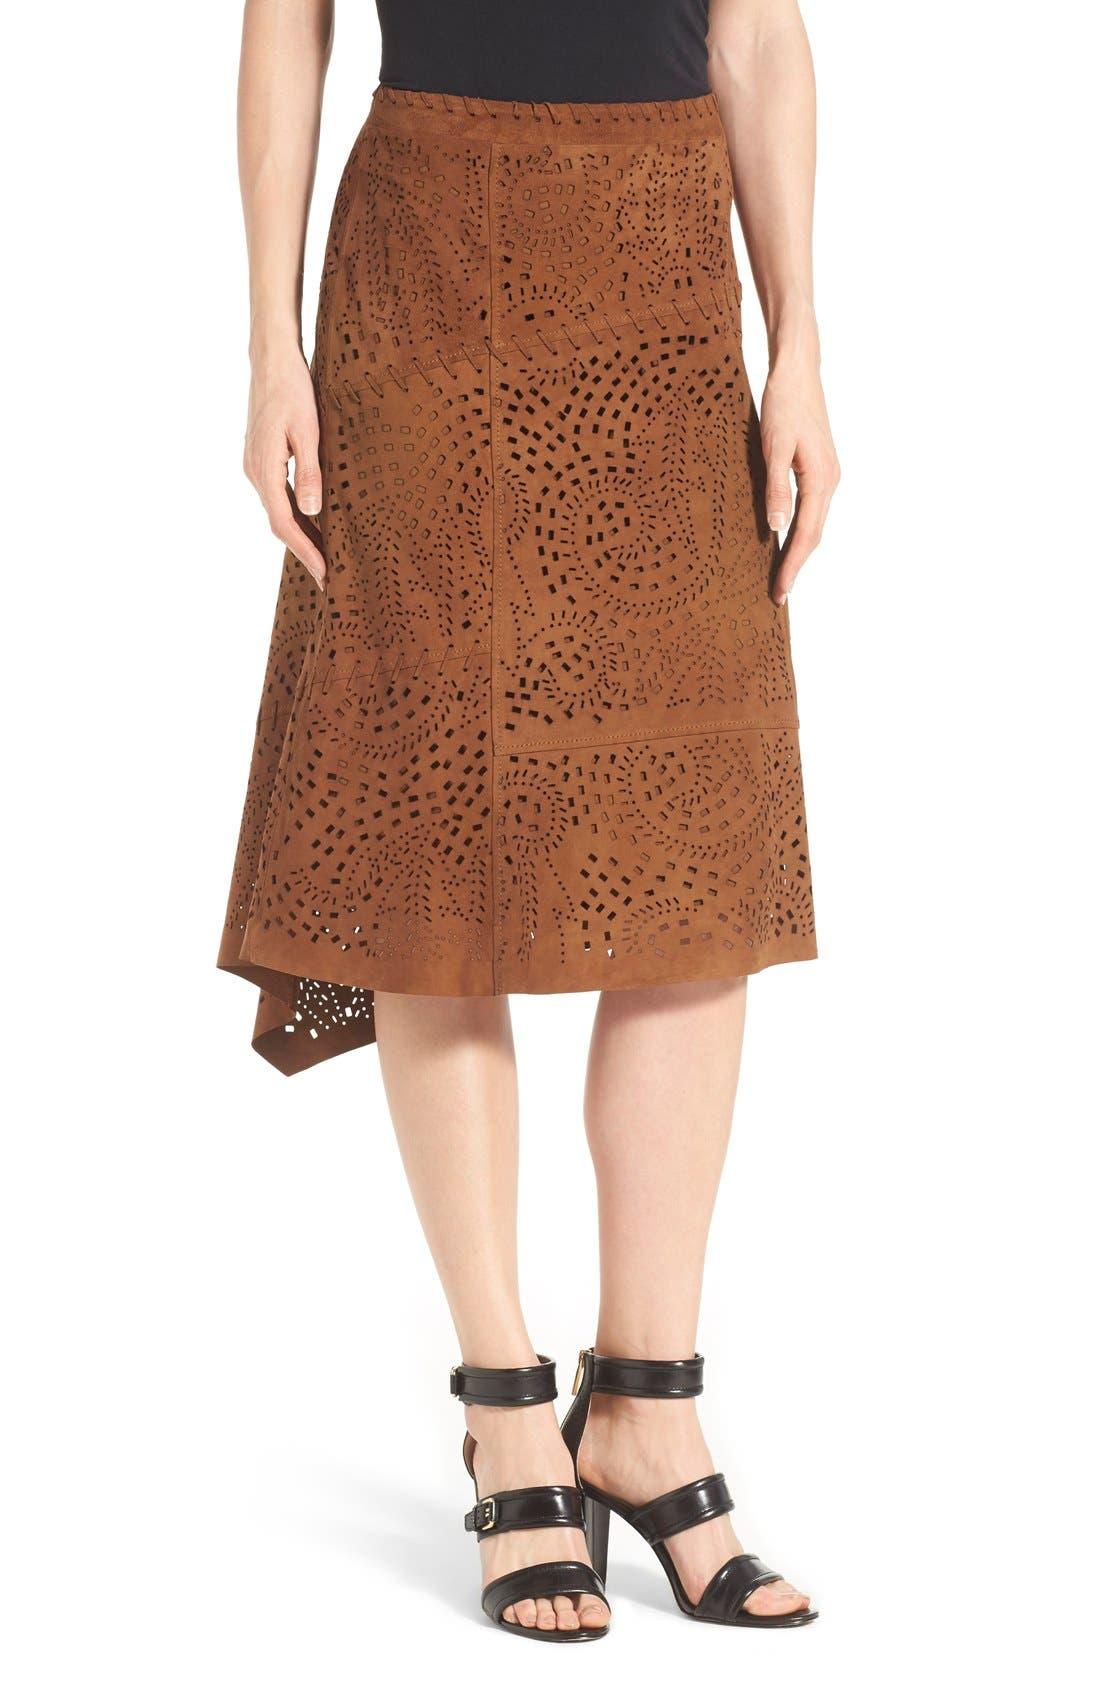 Alternate Image 1 Selected - Kobi Halperin Perforated Suede Asymmetrical A-Line Skirt